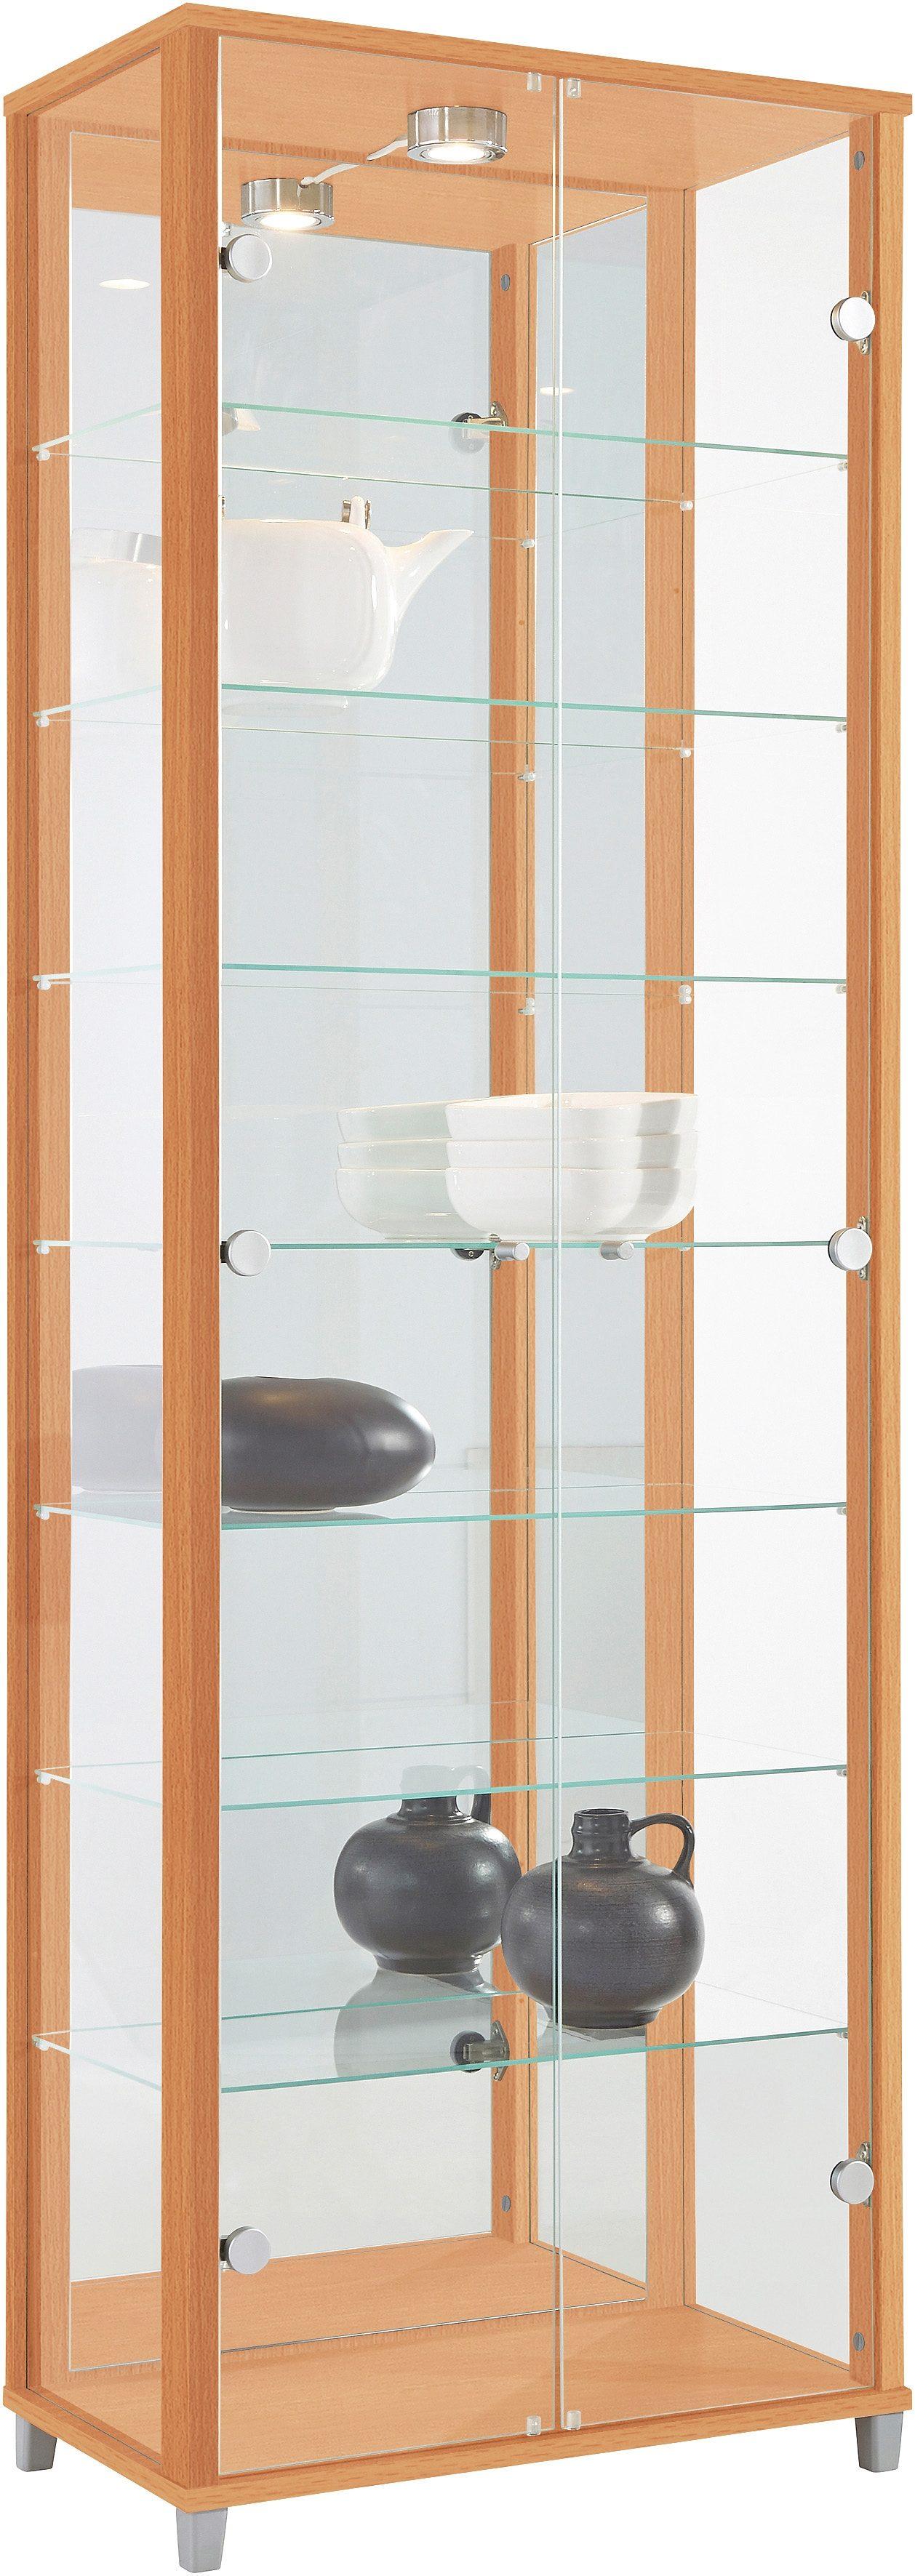 Vitrine, Höhe 172 cm beige Glasvitrinen Vitrinen Vitrine